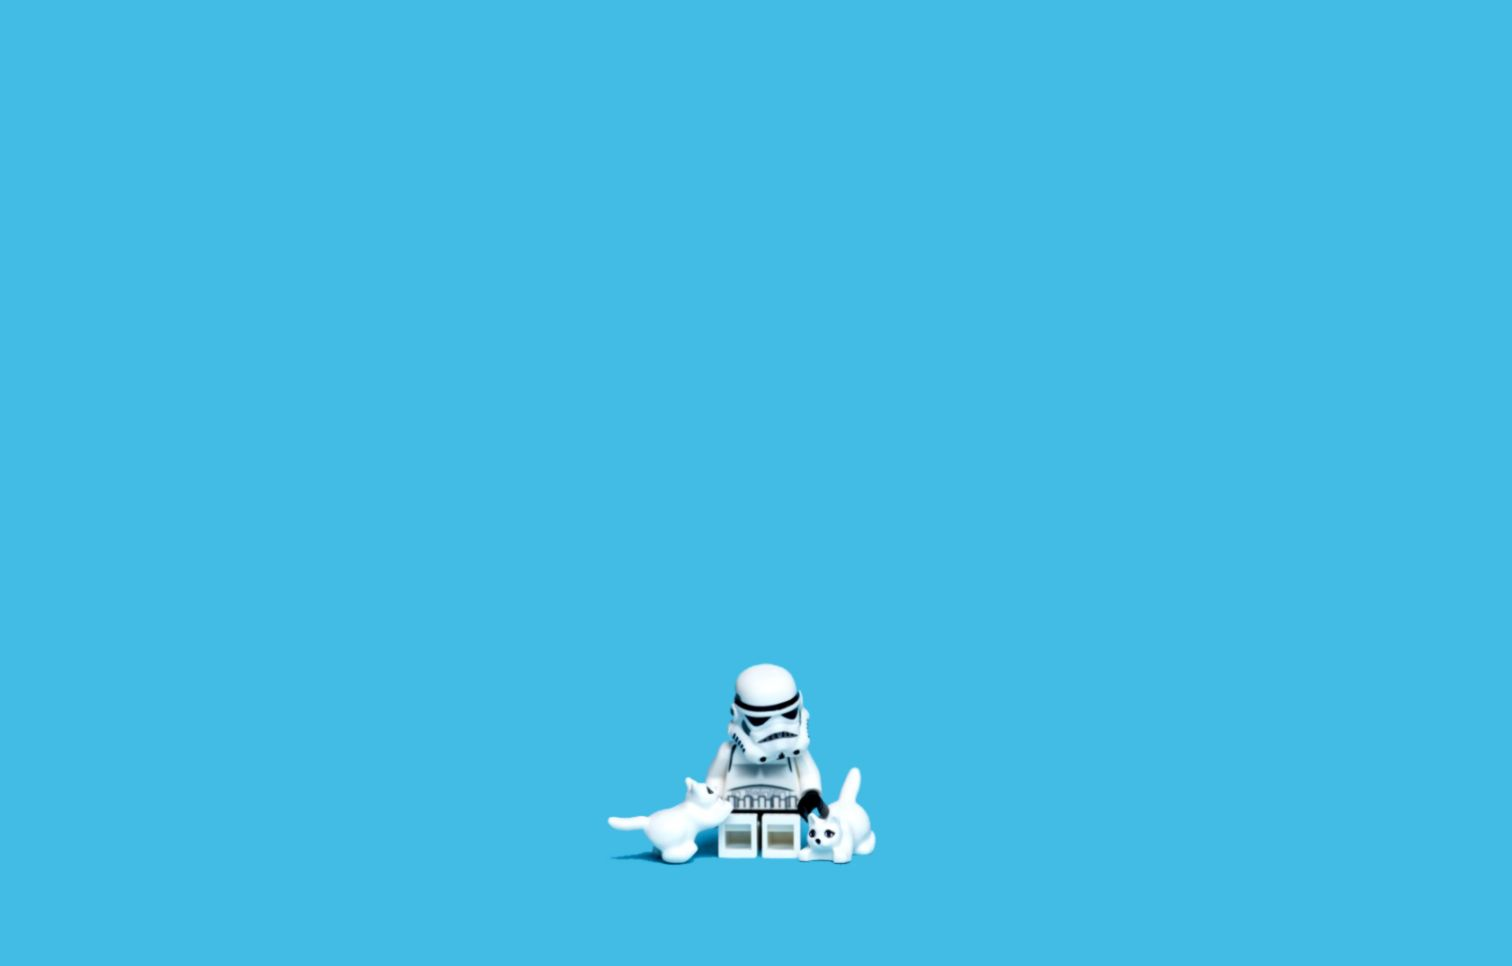 Lego Star Wars Wallpaper All Hd Wallpapers Gallery